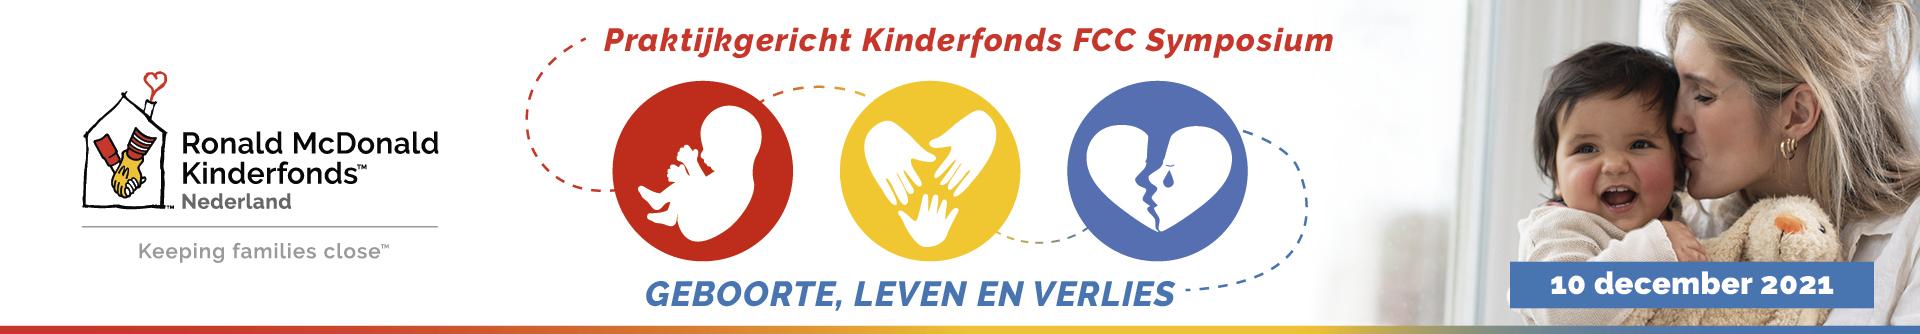 Kinderfonds FCC Symposium